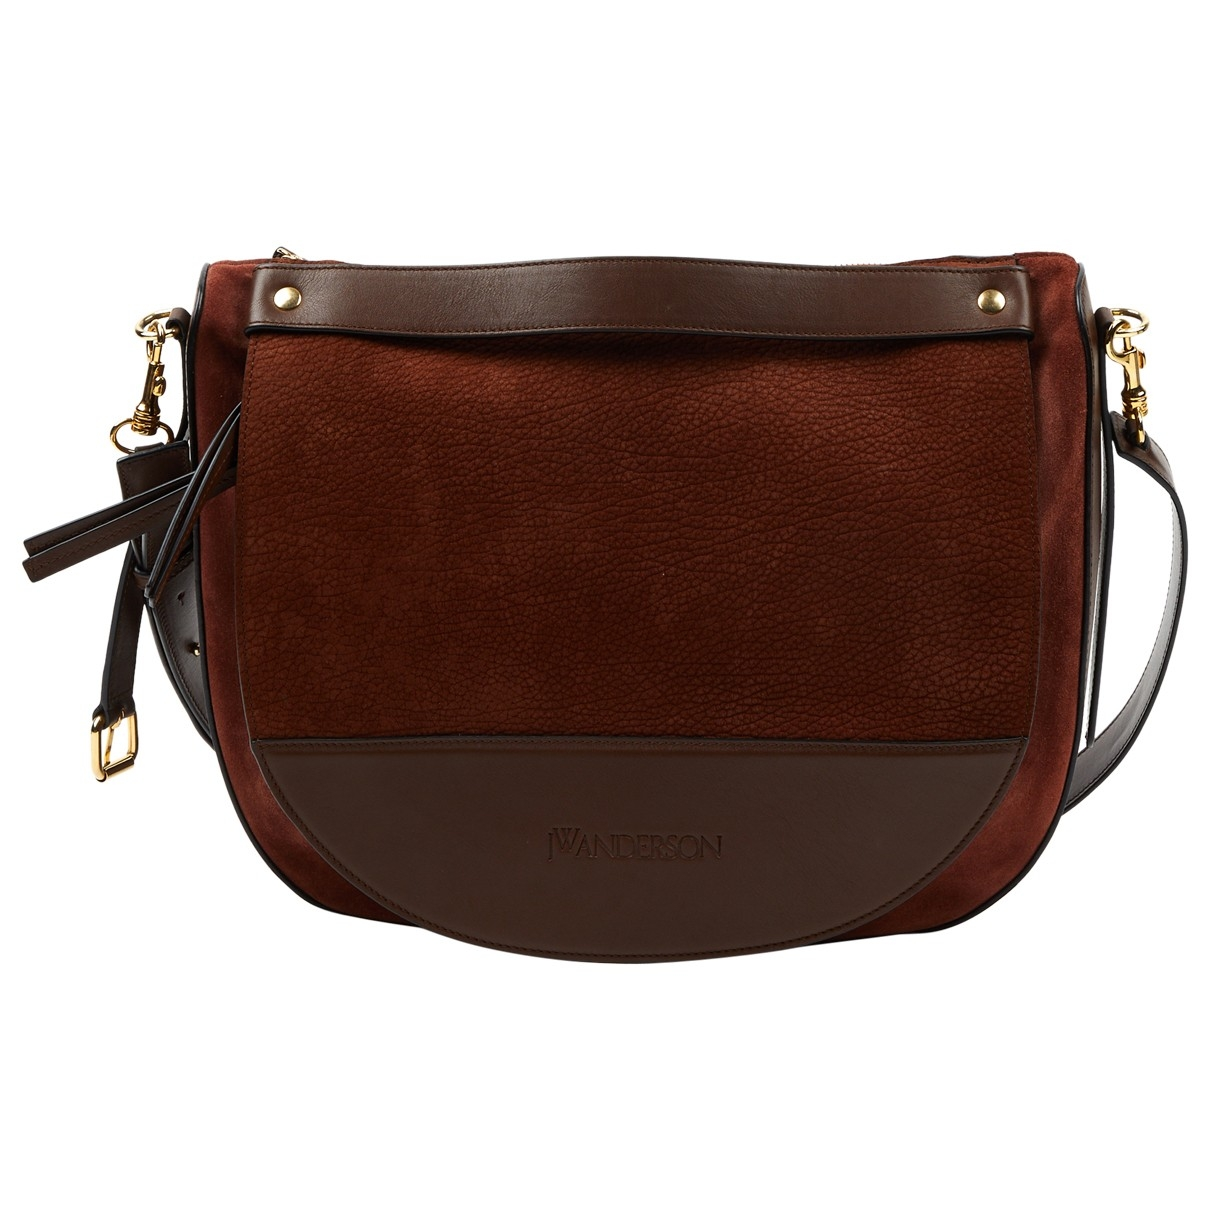 J.w. Anderson Moon Brown Leather handbag for Women \N